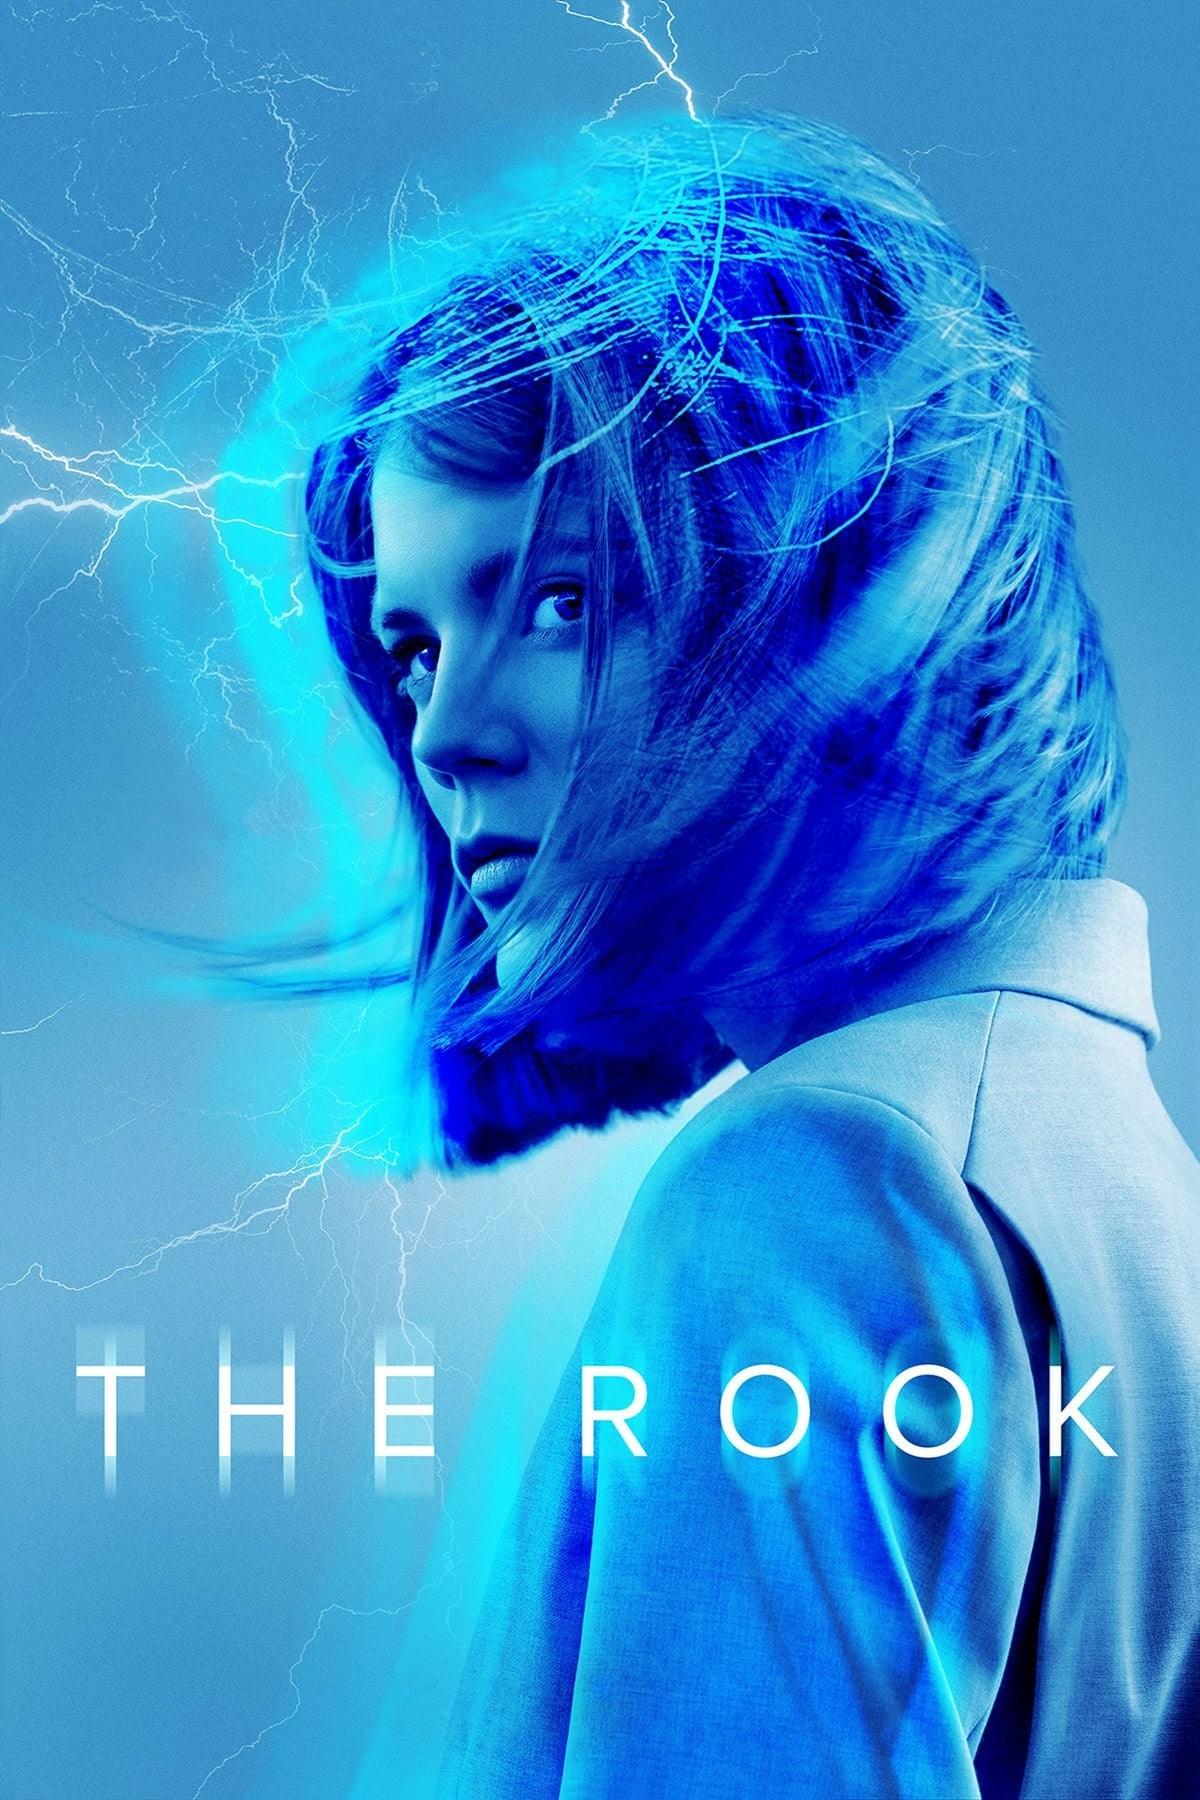 Subscene - The Rook - First Season English subtitle